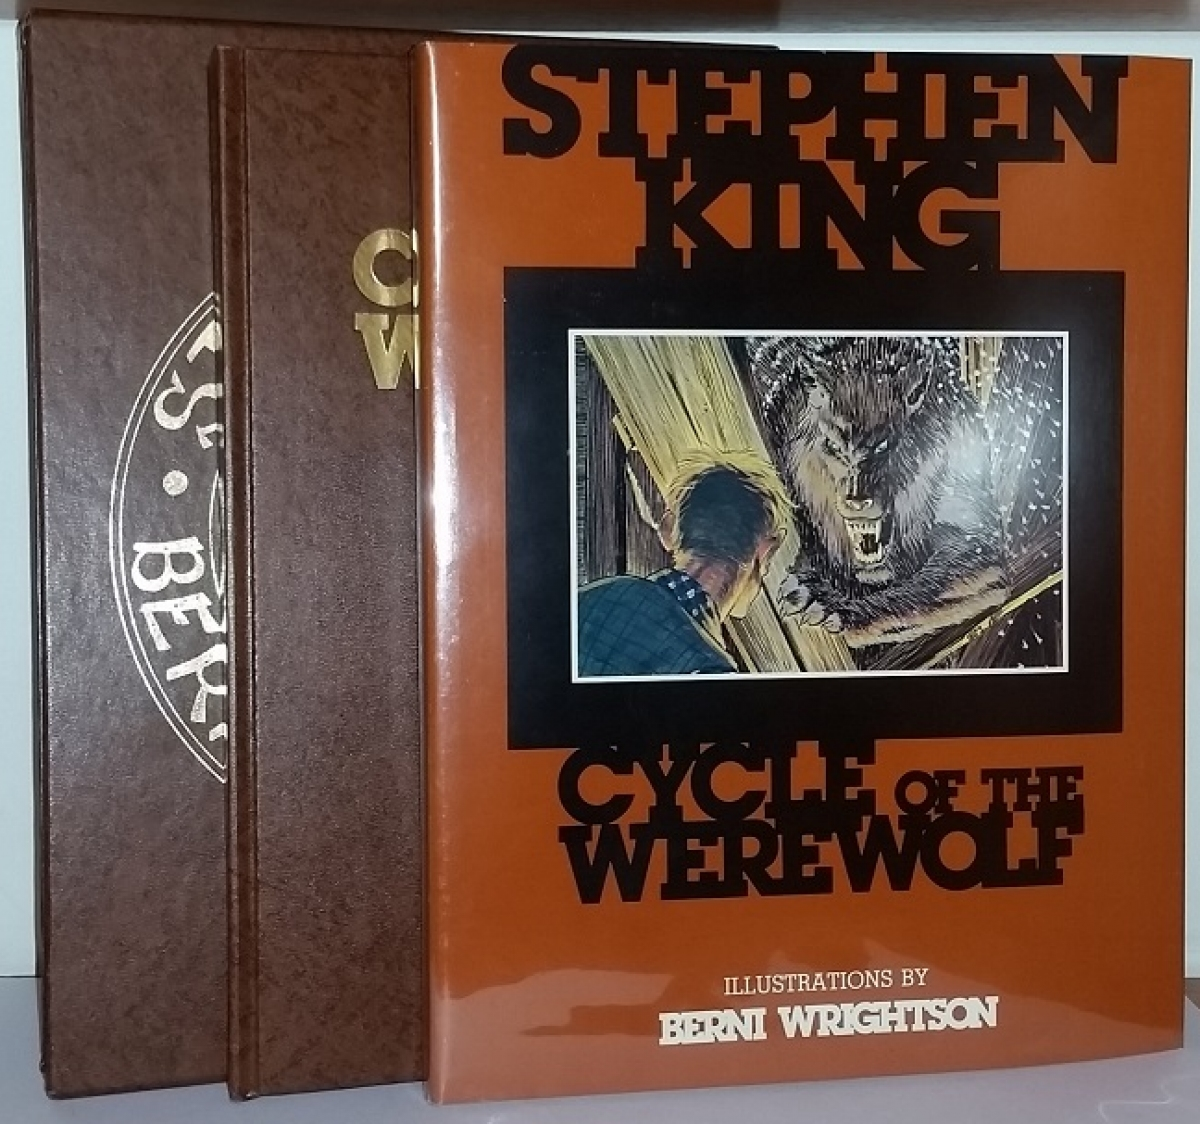 """Cycle of the Werewolf"" - etui, książka i obwoluta - obrazek"